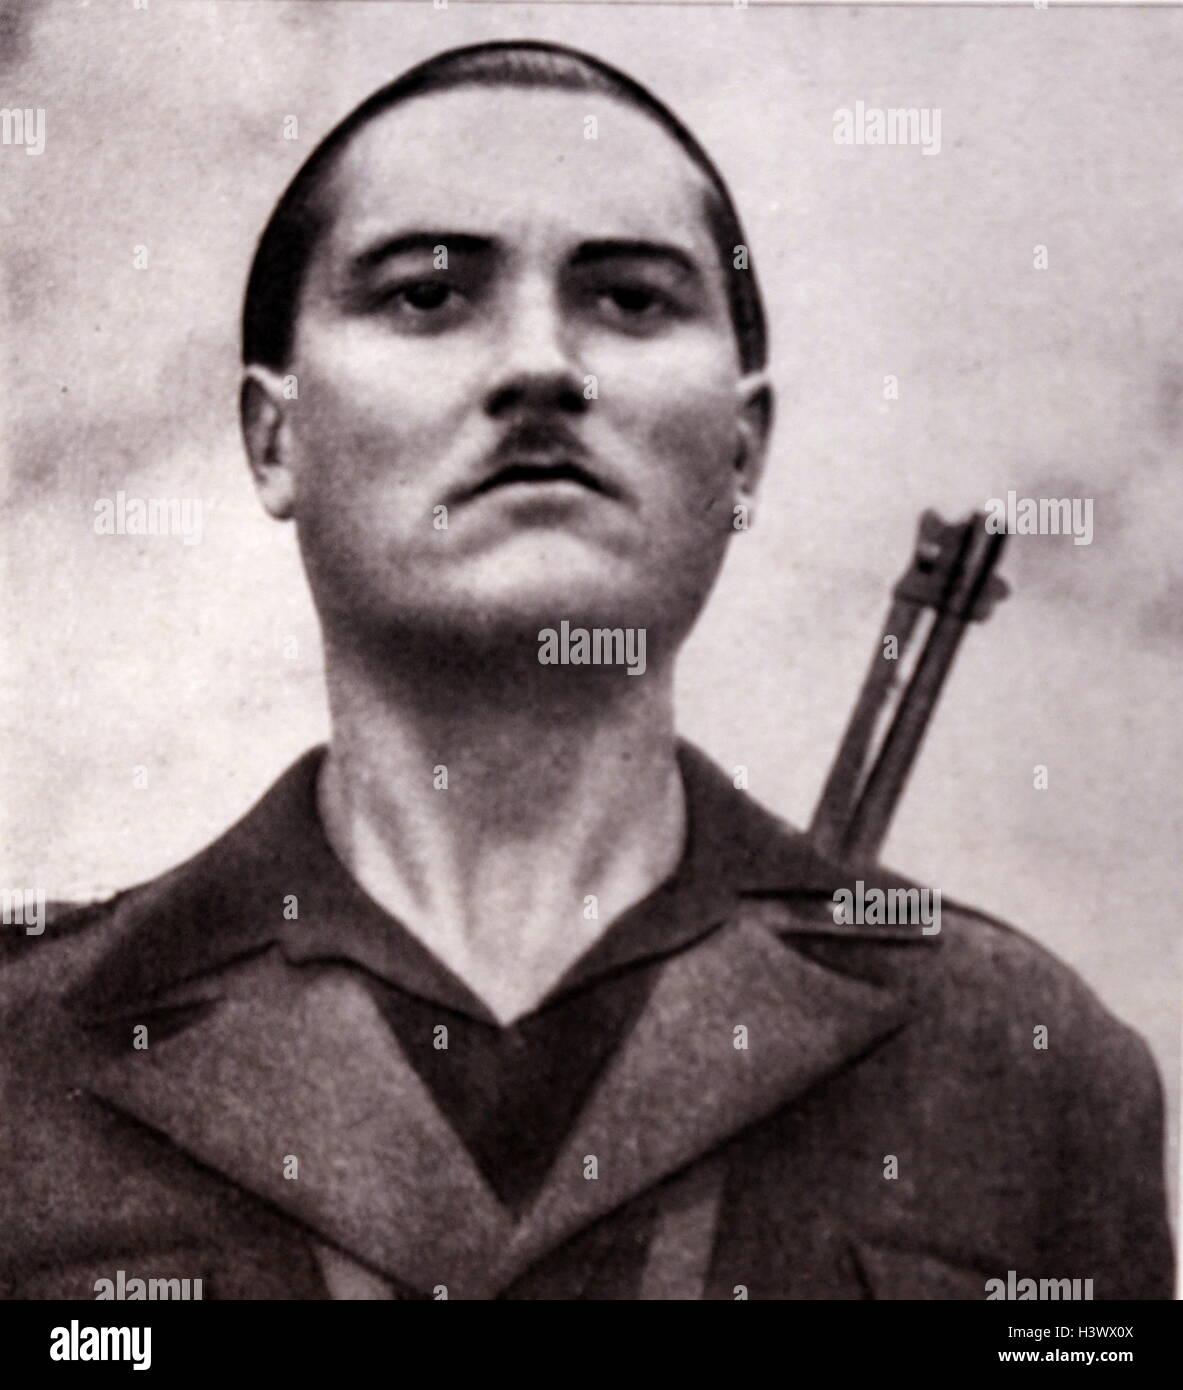 Italian propaganda postcard of an armed Fascist militia member 1936 - Stock Image